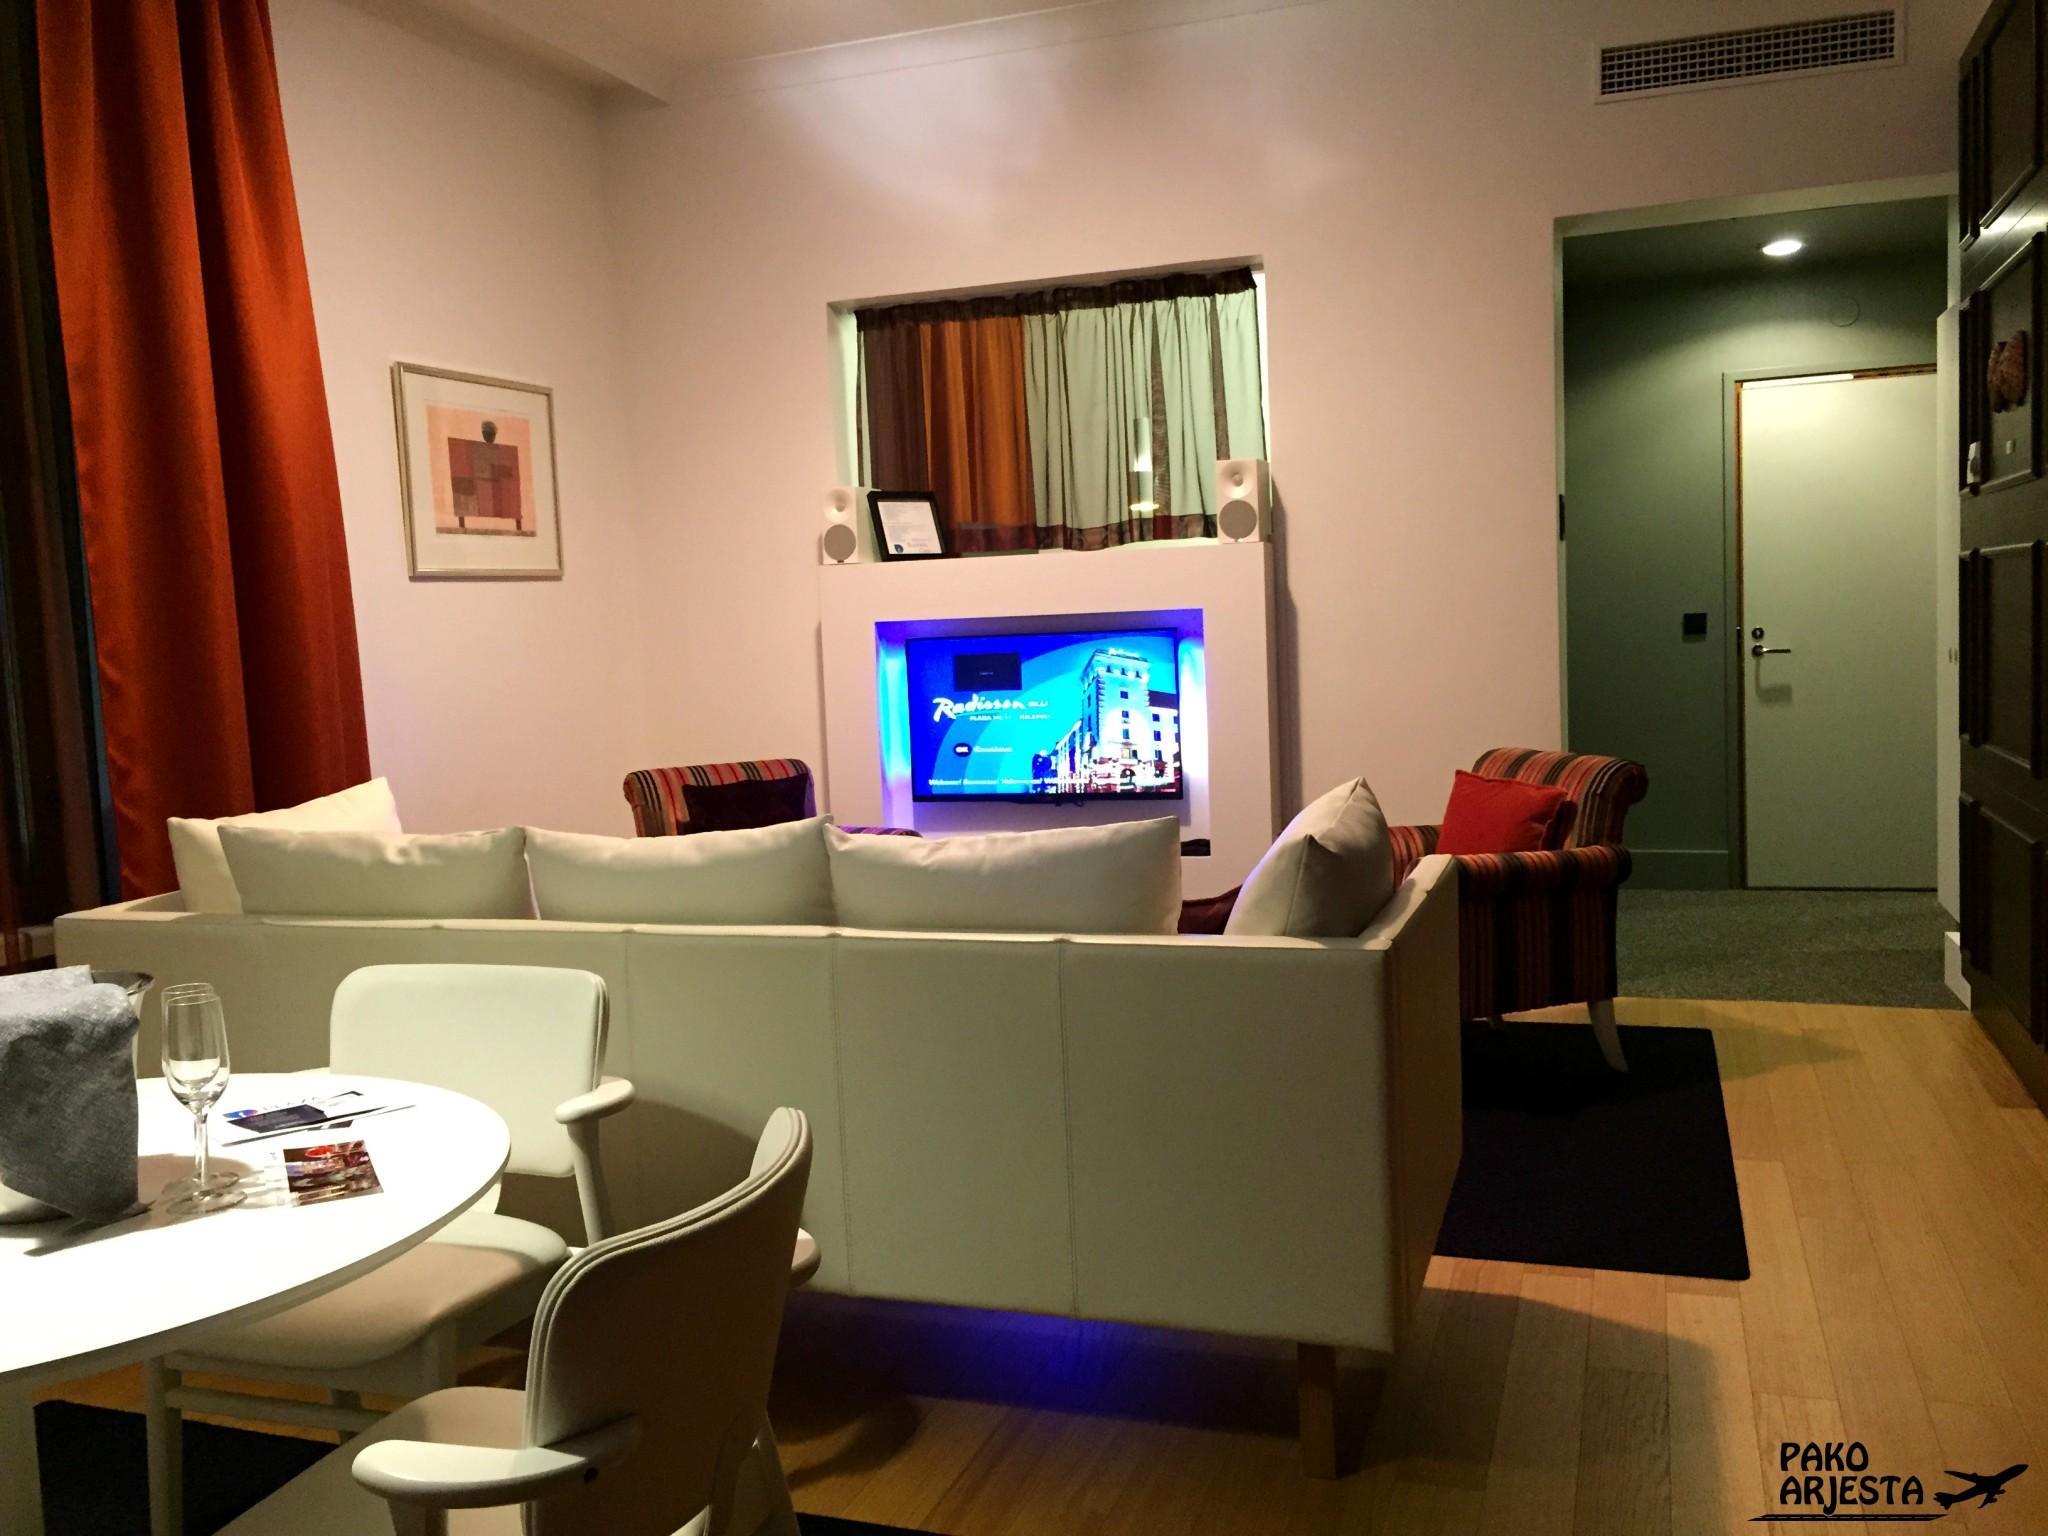 Radisson Blu Plaza Helsinki Kauno Suite 5